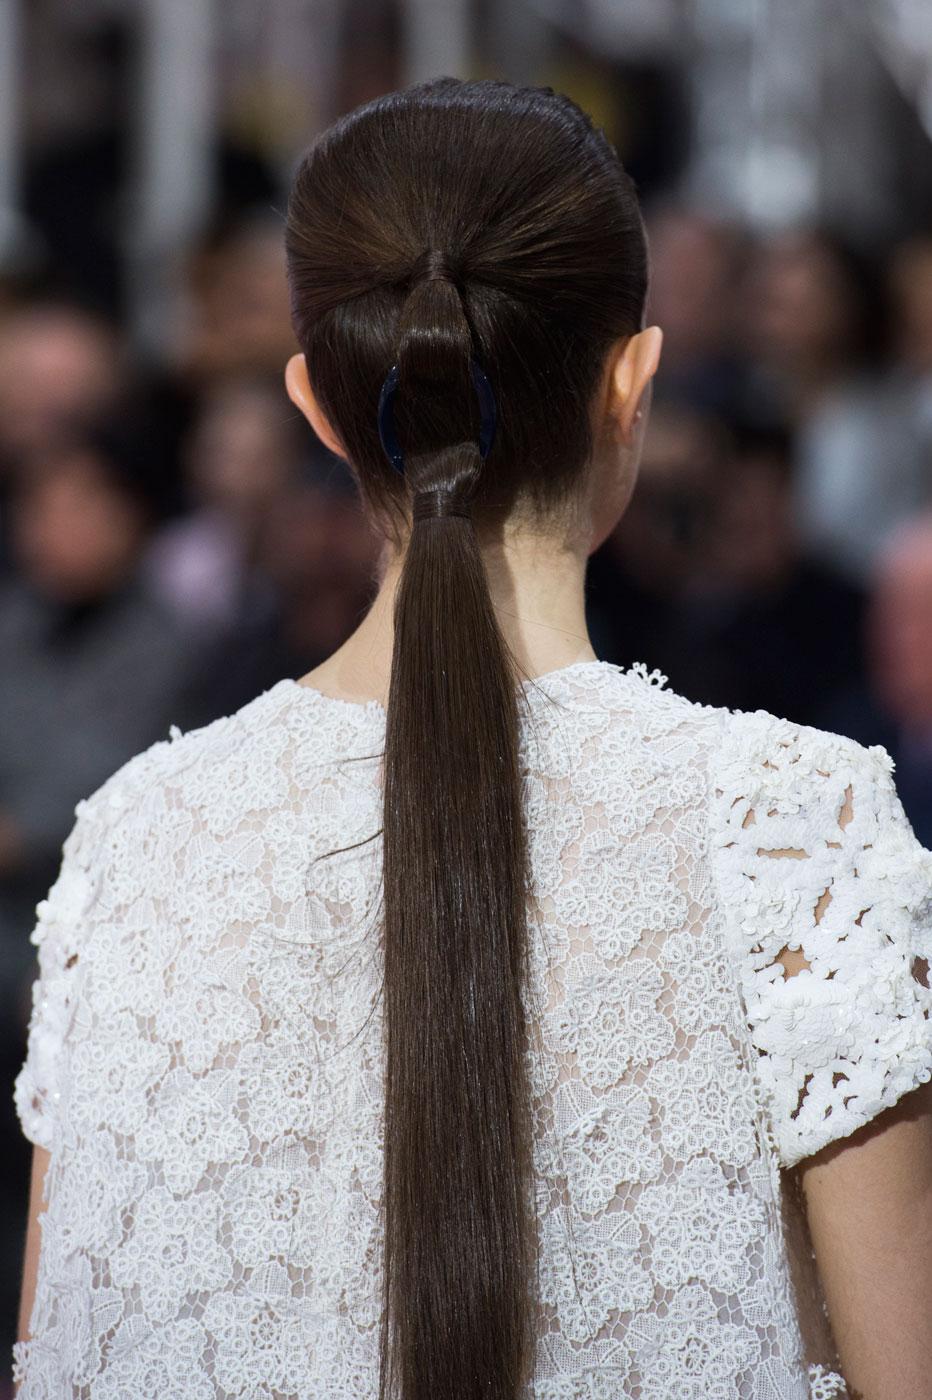 Christian-Dior-fashion-runway-show-close-ups-haute-couture-paris-spring-summer-2015-the-impression-198